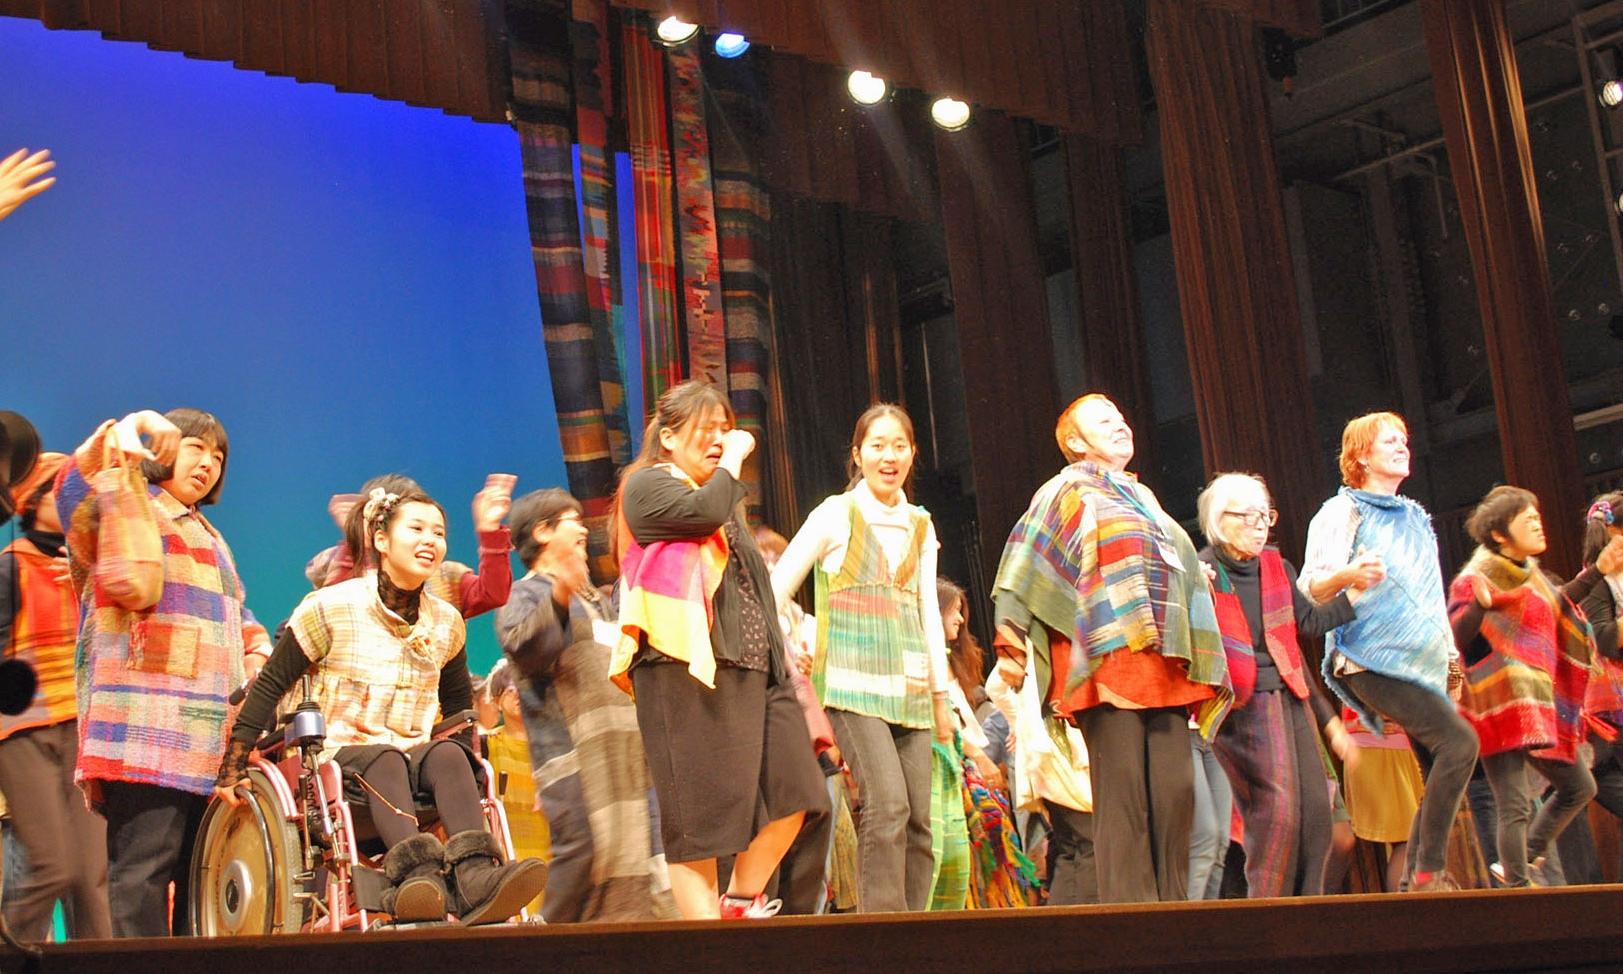 SAORI 40th Anniversary Event in Osaka, Japan in 2009.